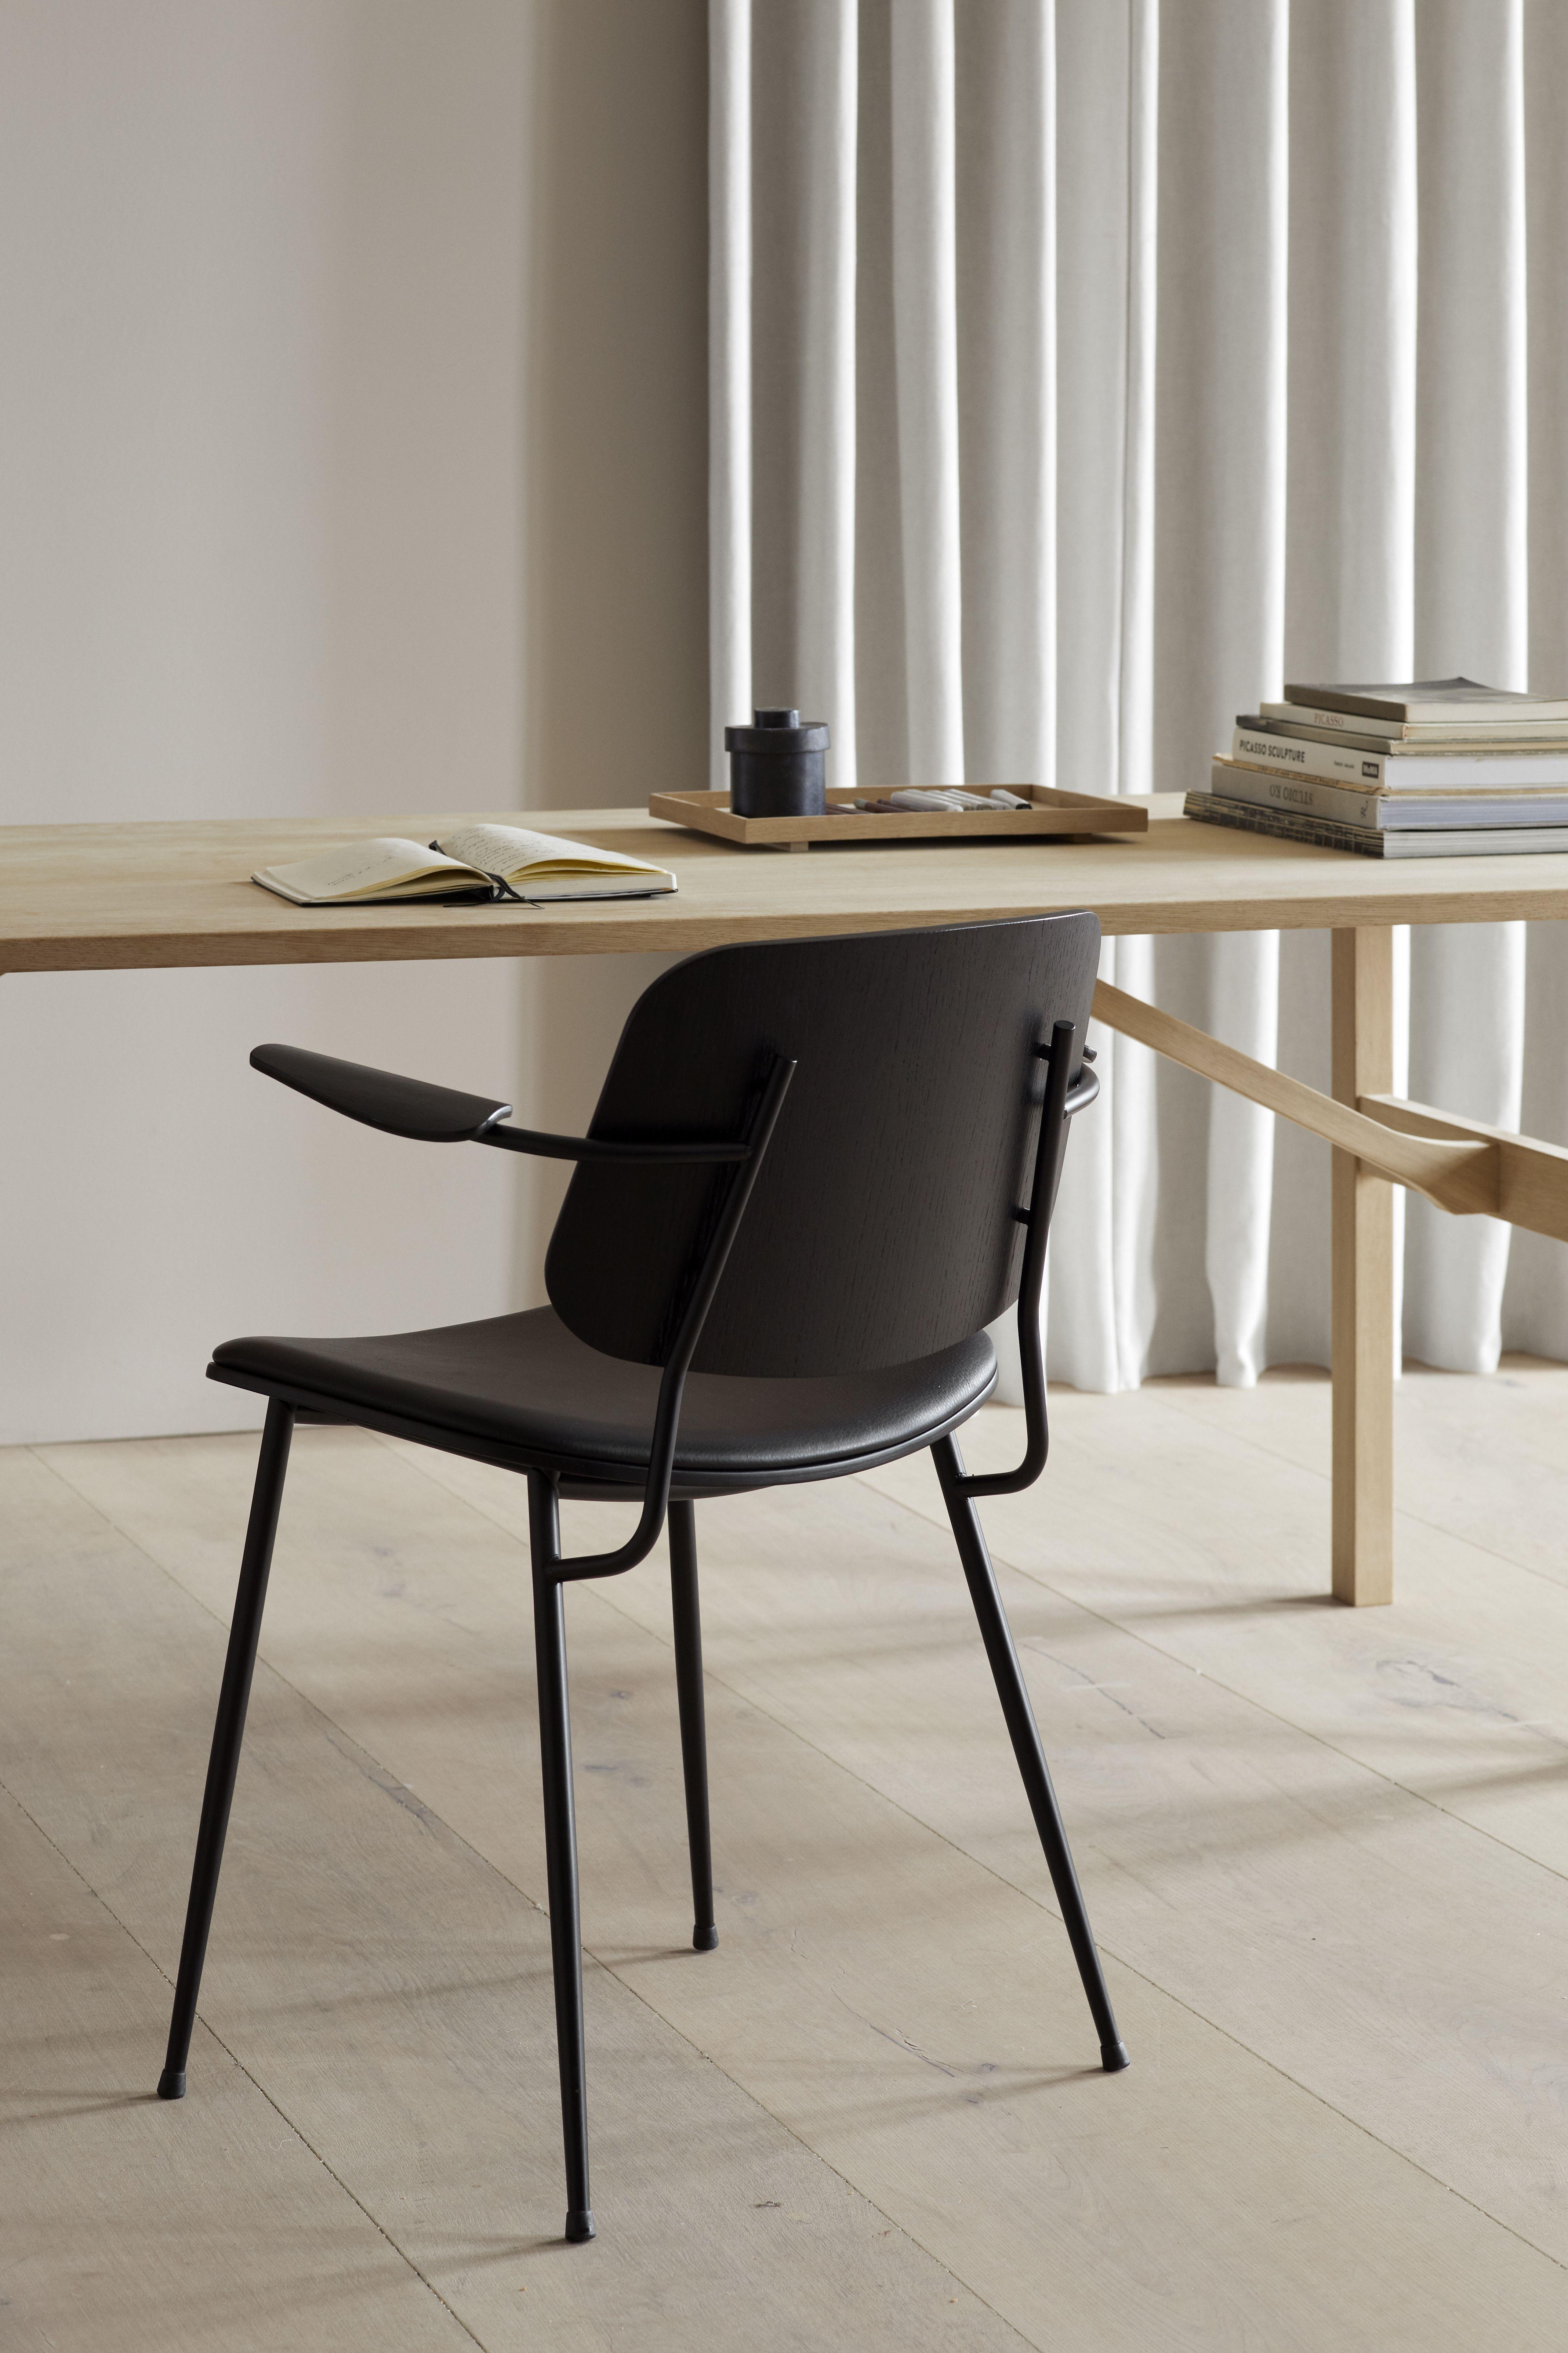 Fredericia Furniture 3061 Søborg Stol Sædepolstring | 家具